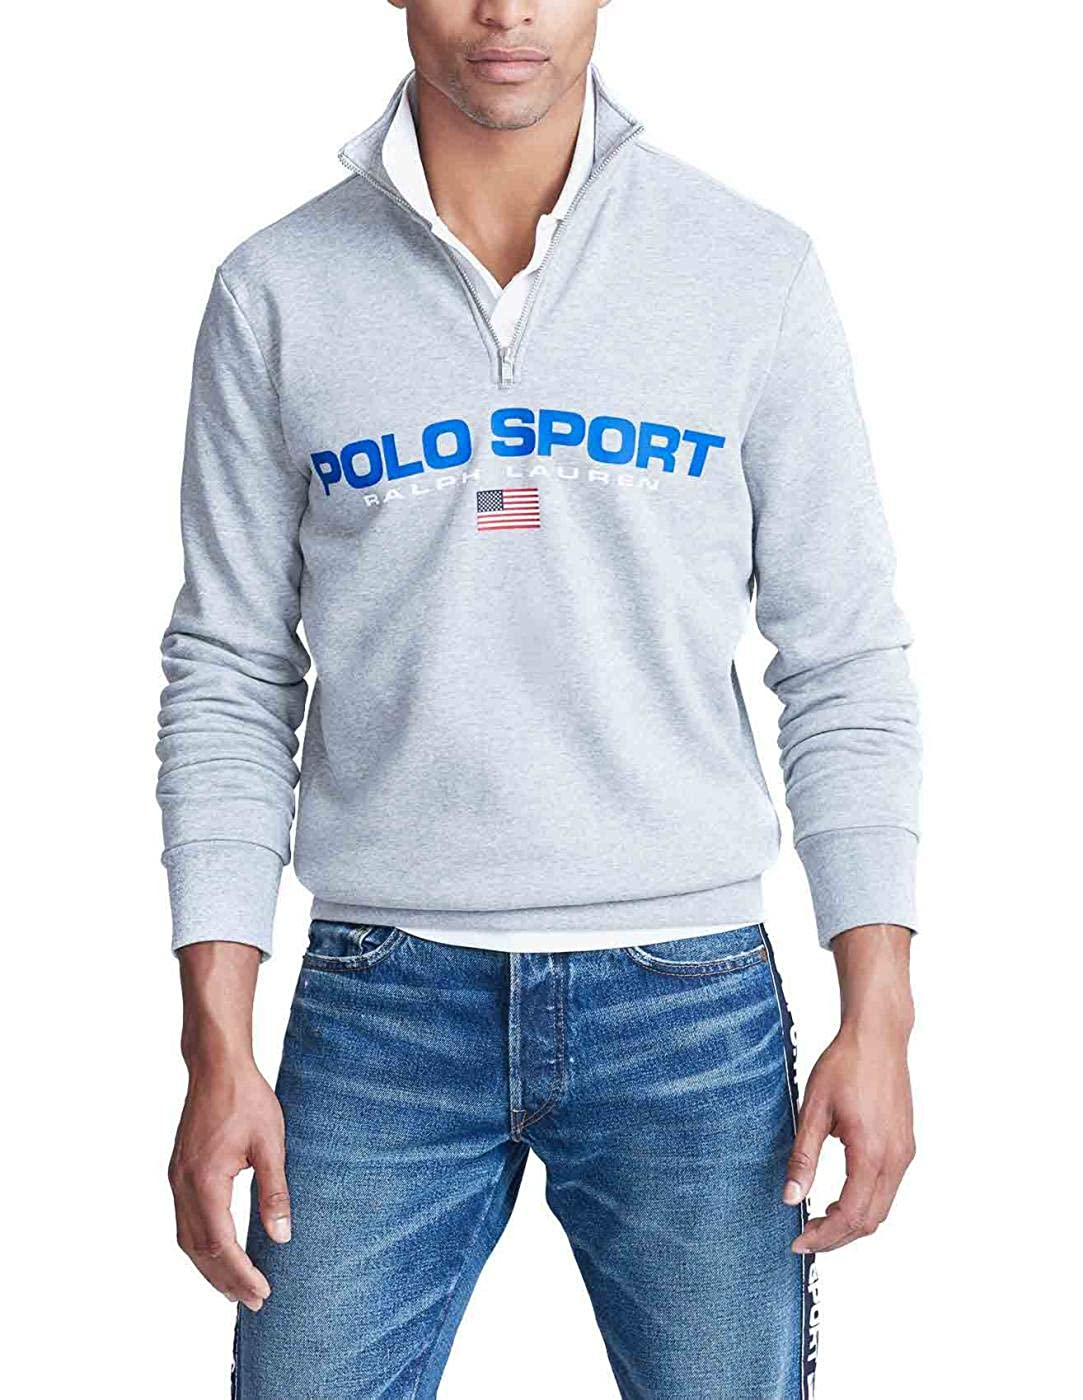 Felpa Ralph Lauren Polo Sport Gris Hombre XL Gris: Amazon.es: Ropa ...